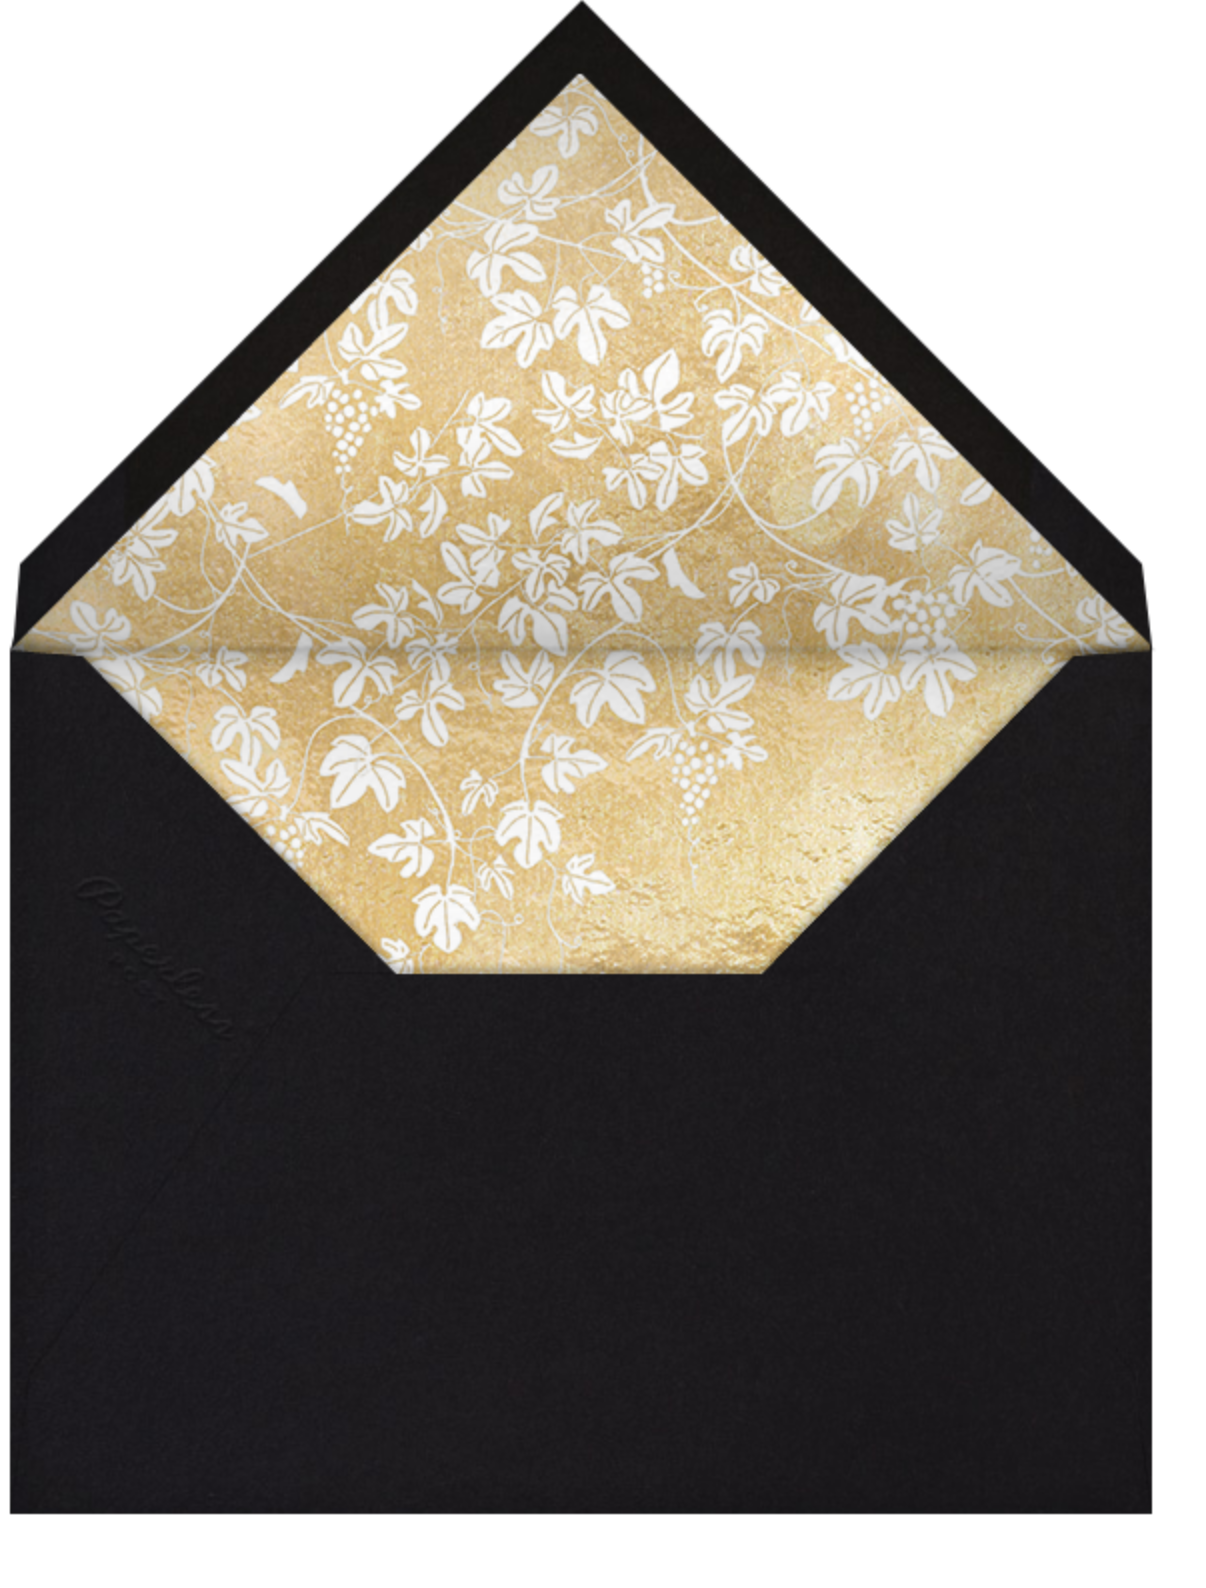 Vineyard II (Photo Announcement) - Gold - Paperless Post - Wedding - envelope back